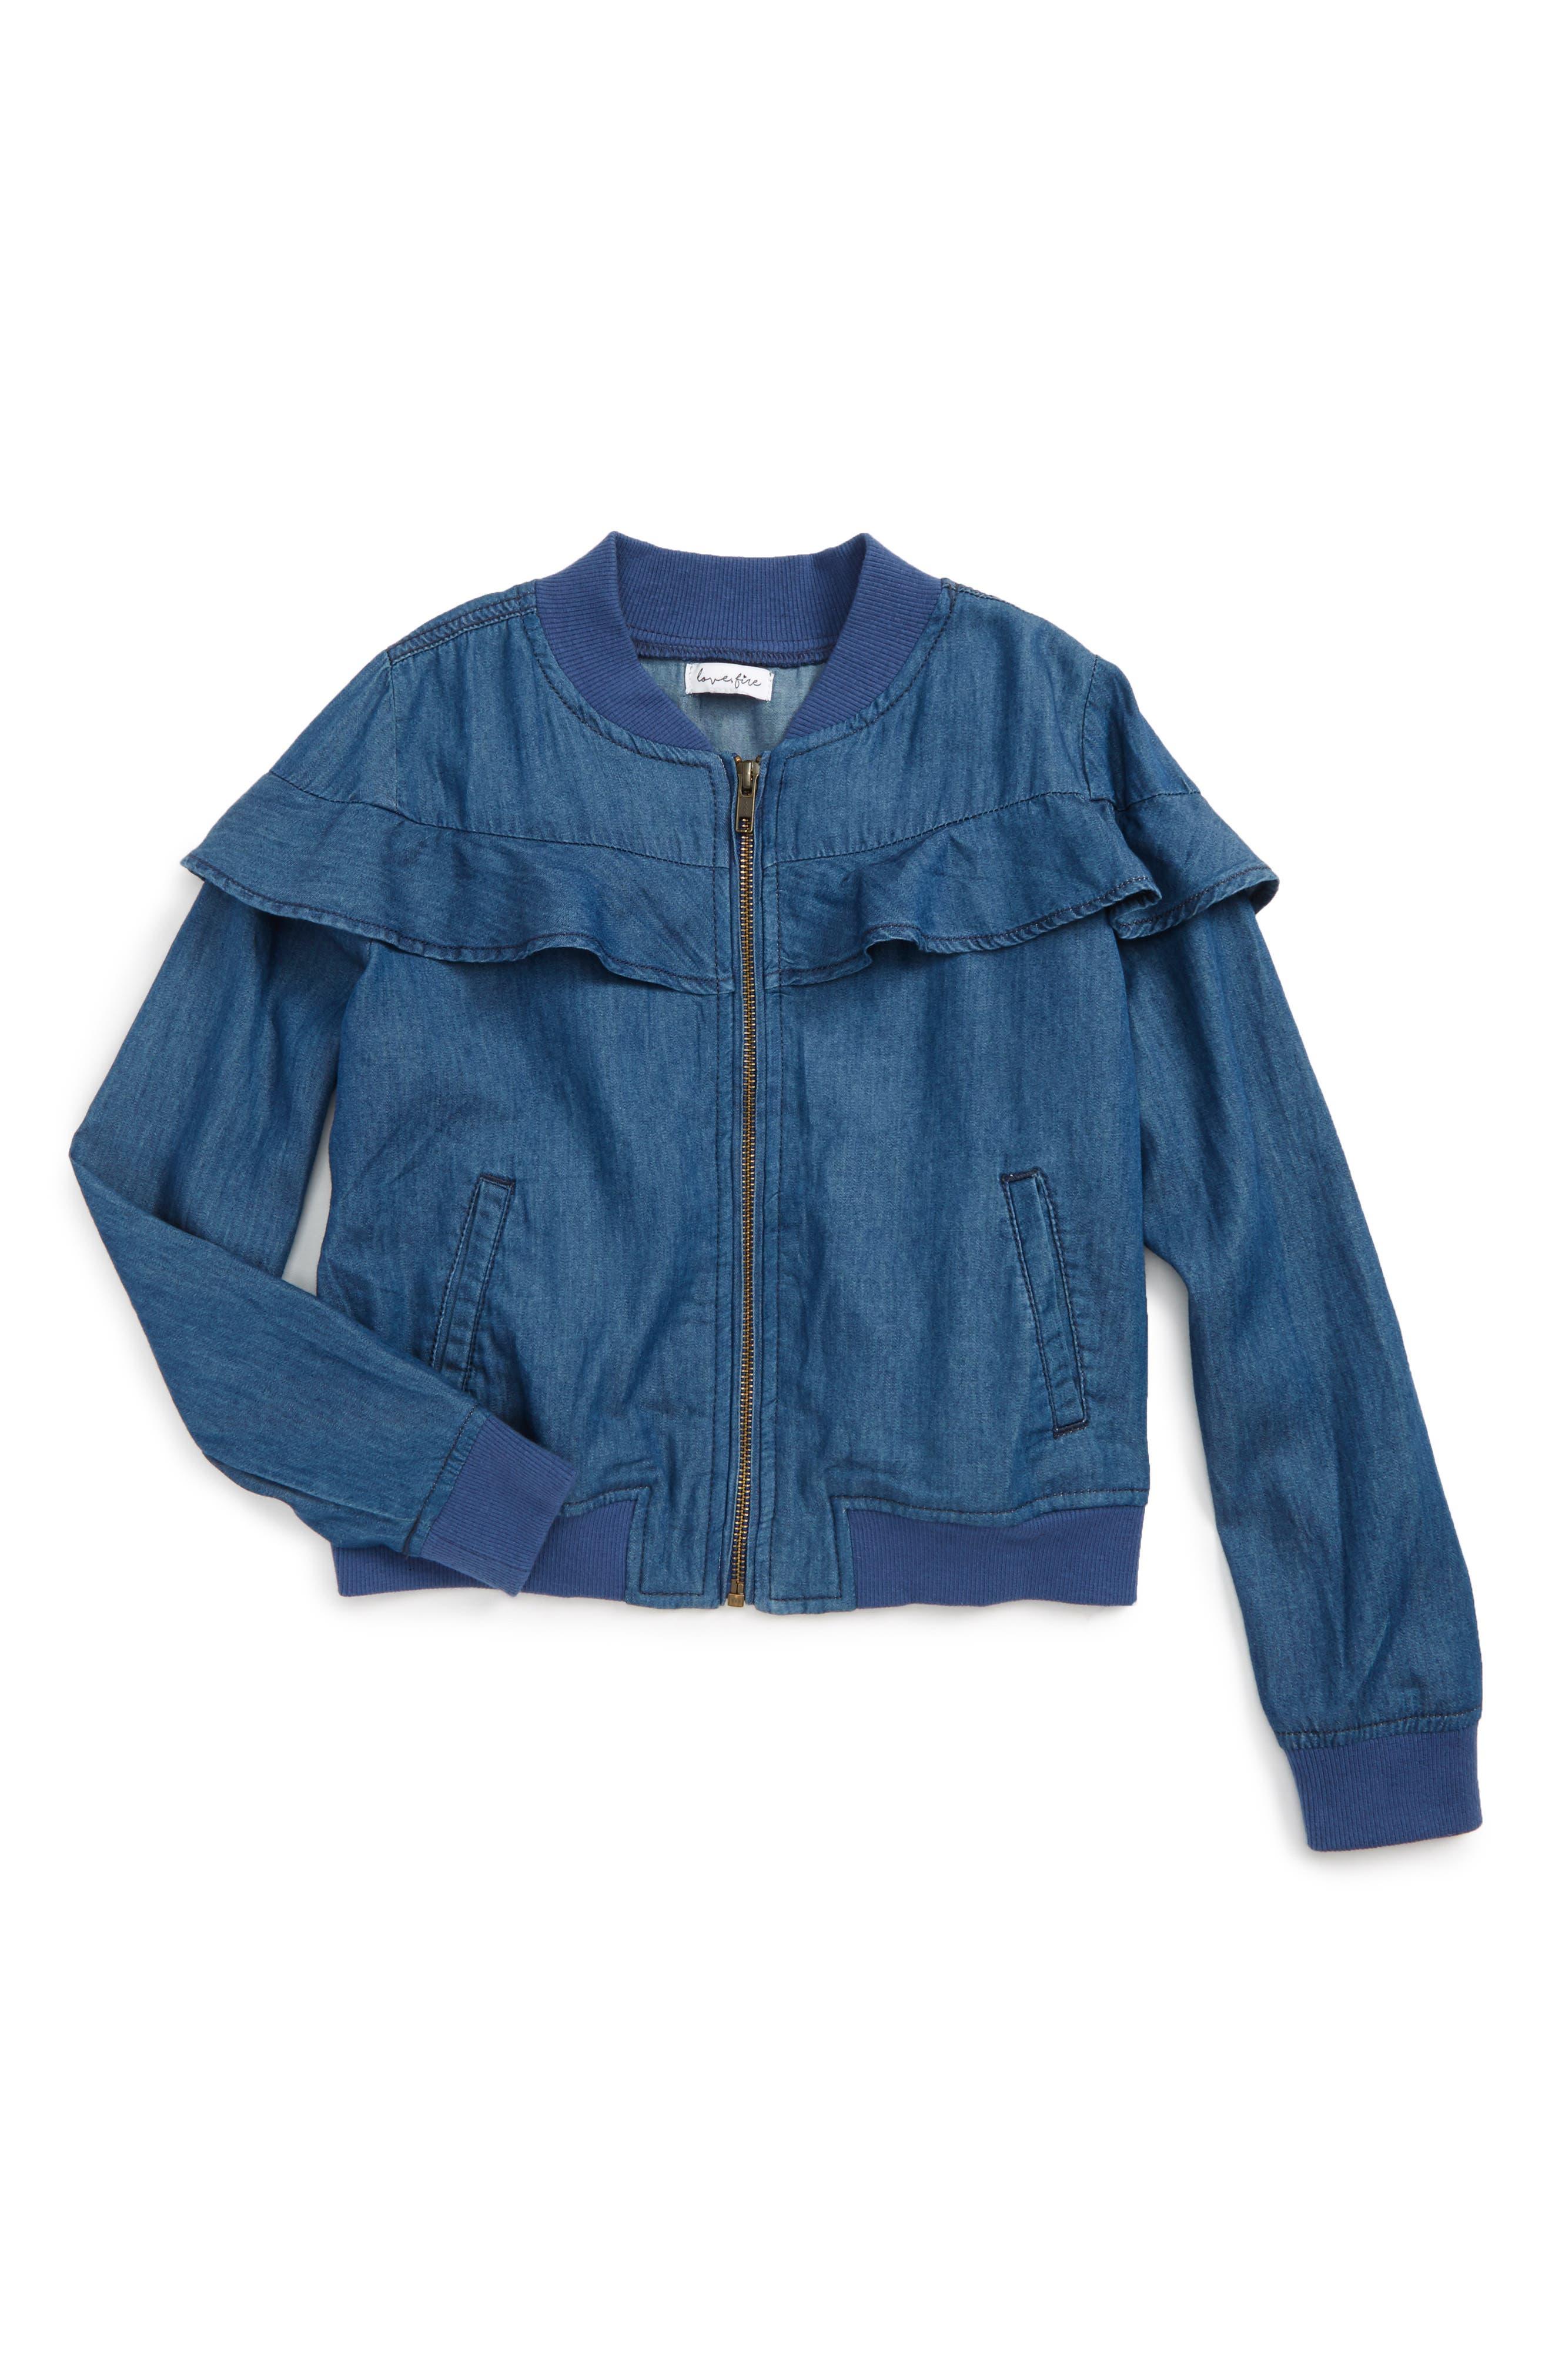 Ruffle Denim Jacket,                             Main thumbnail 1, color,                             426